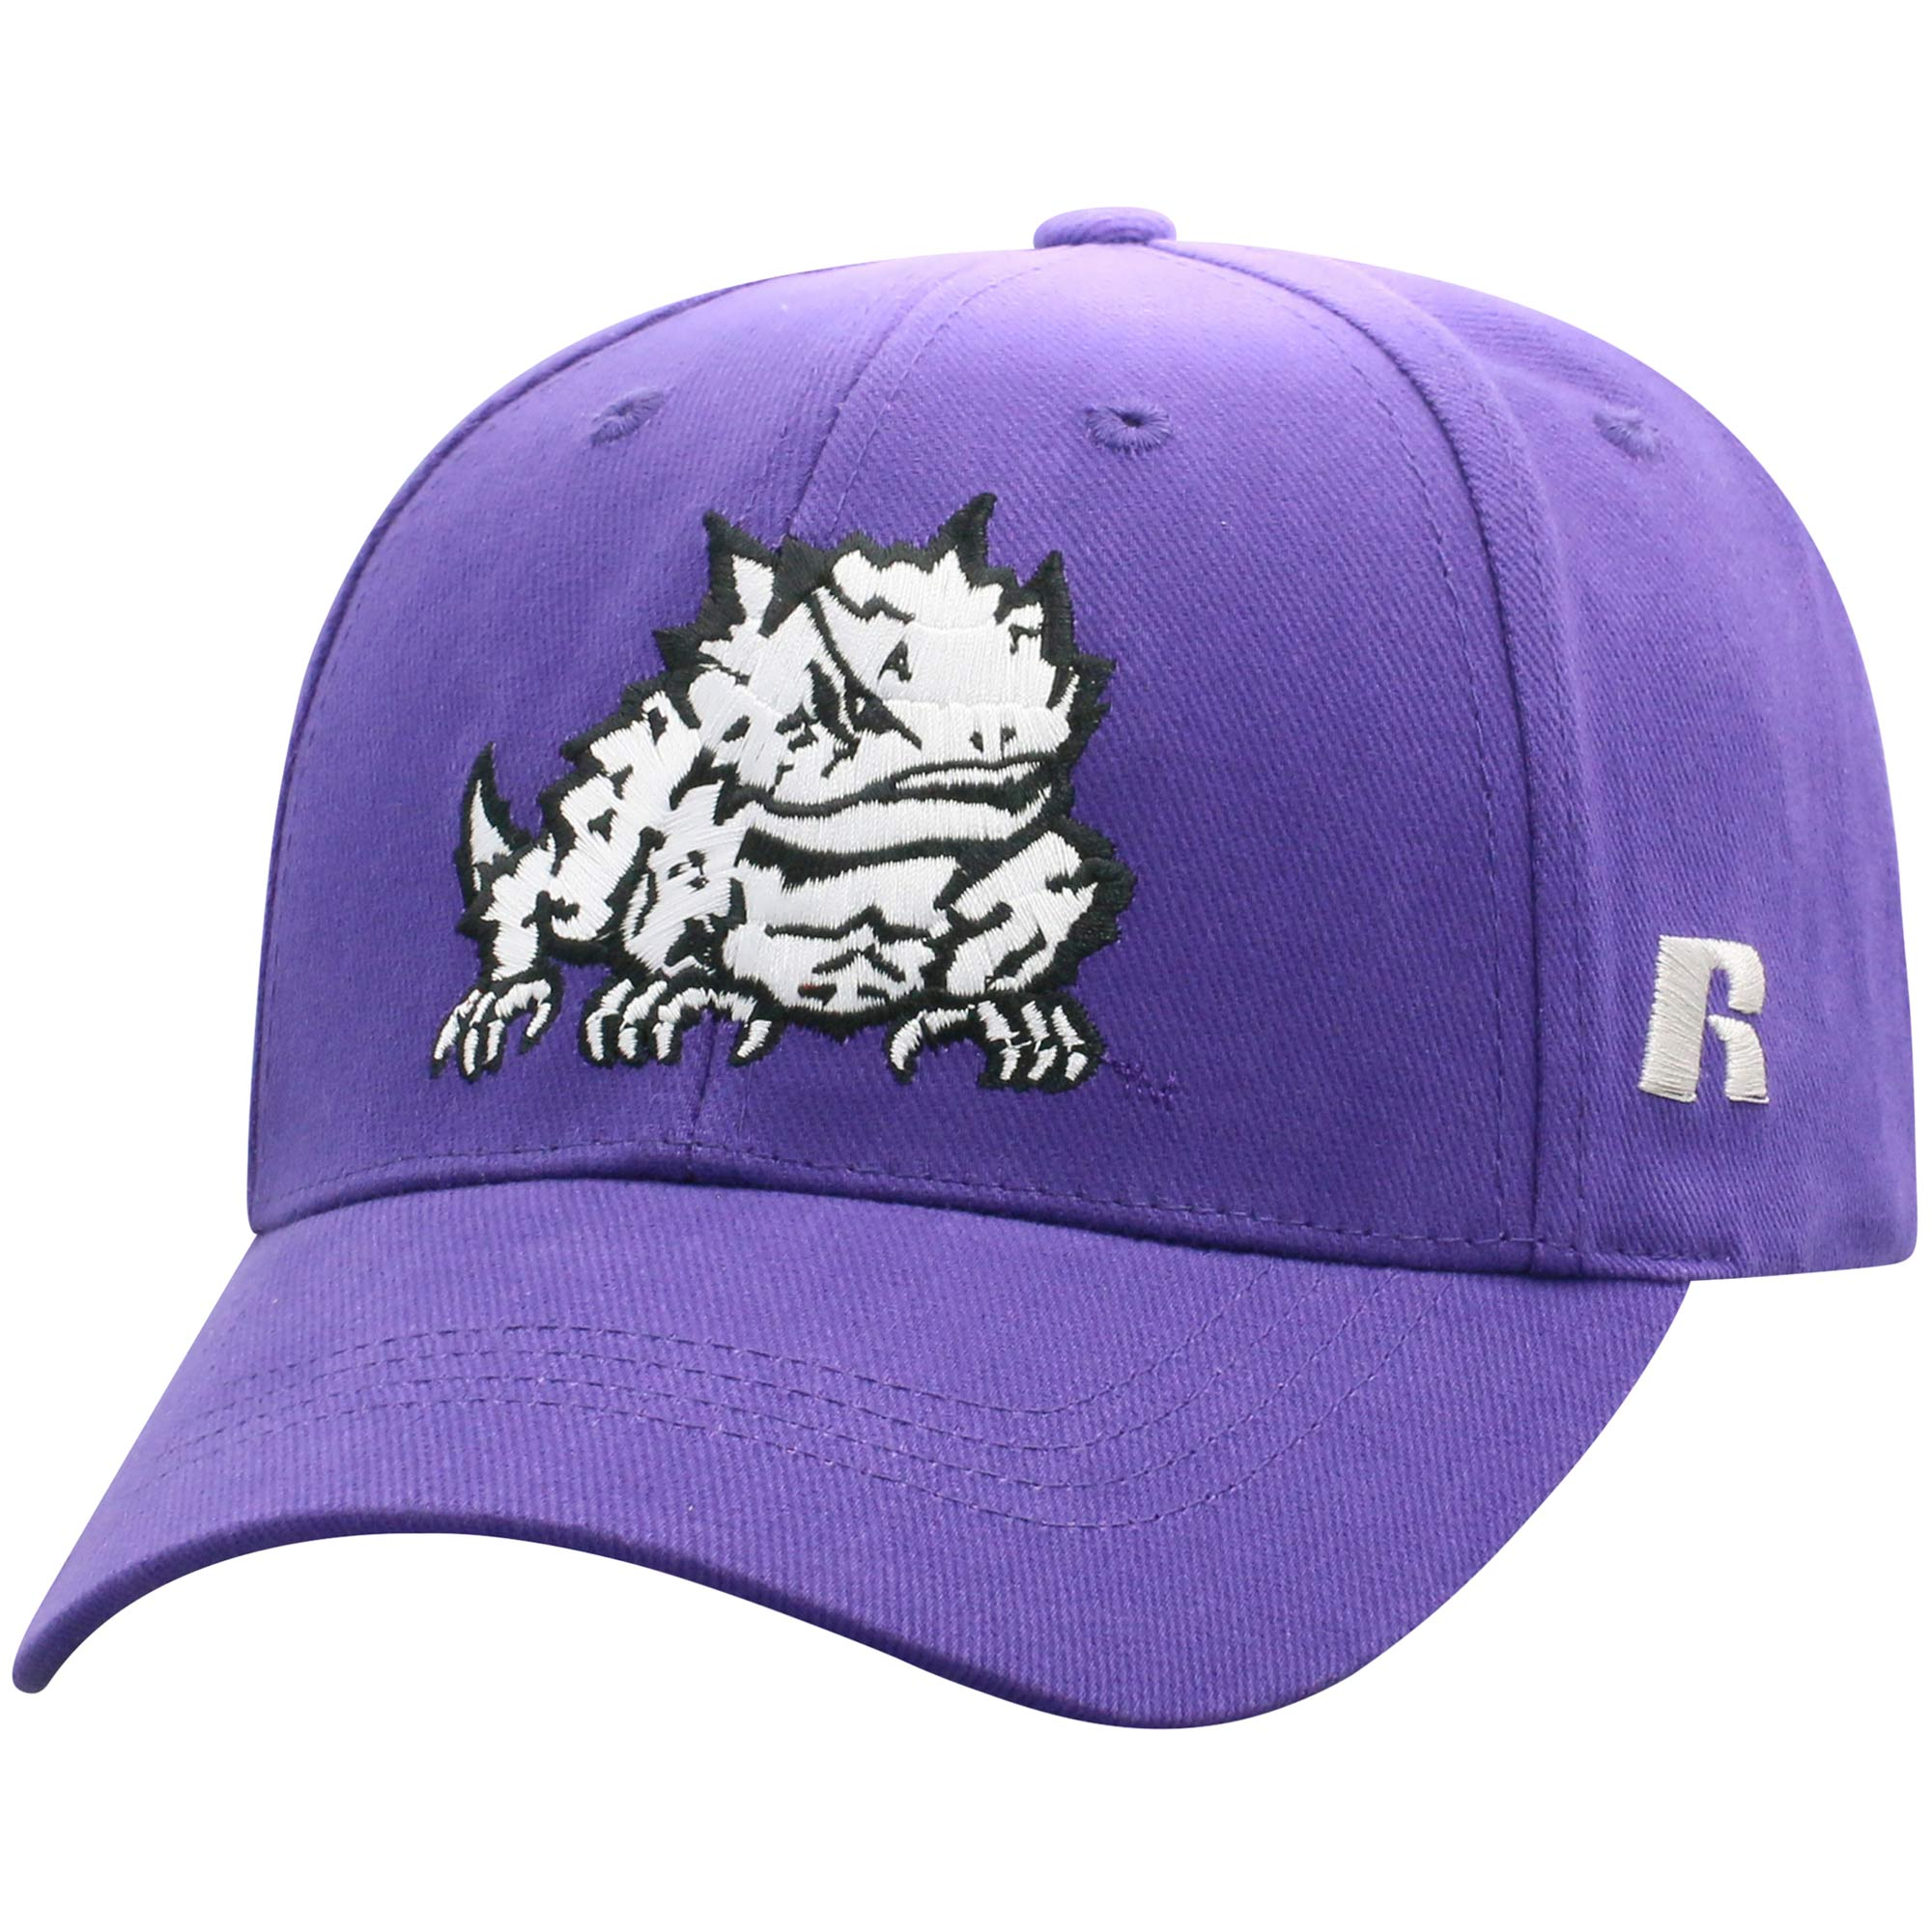 Men's Russell Purple TCU Horned Frogs Endless Adjustable Hat - OSFA